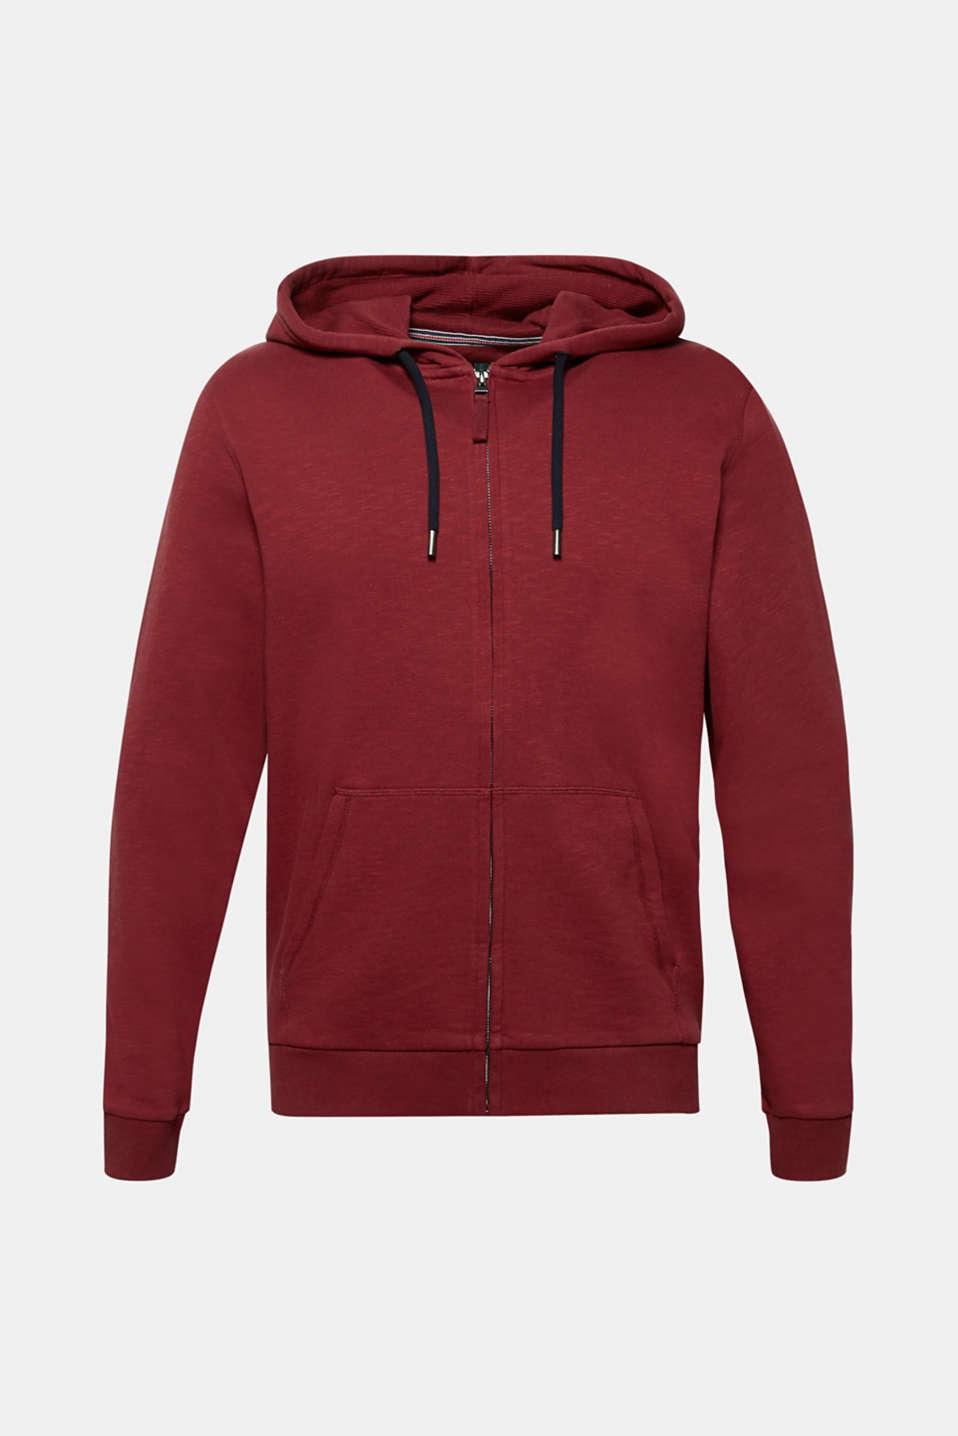 Sweatshirts, BORDEAUX RED, detail image number 7